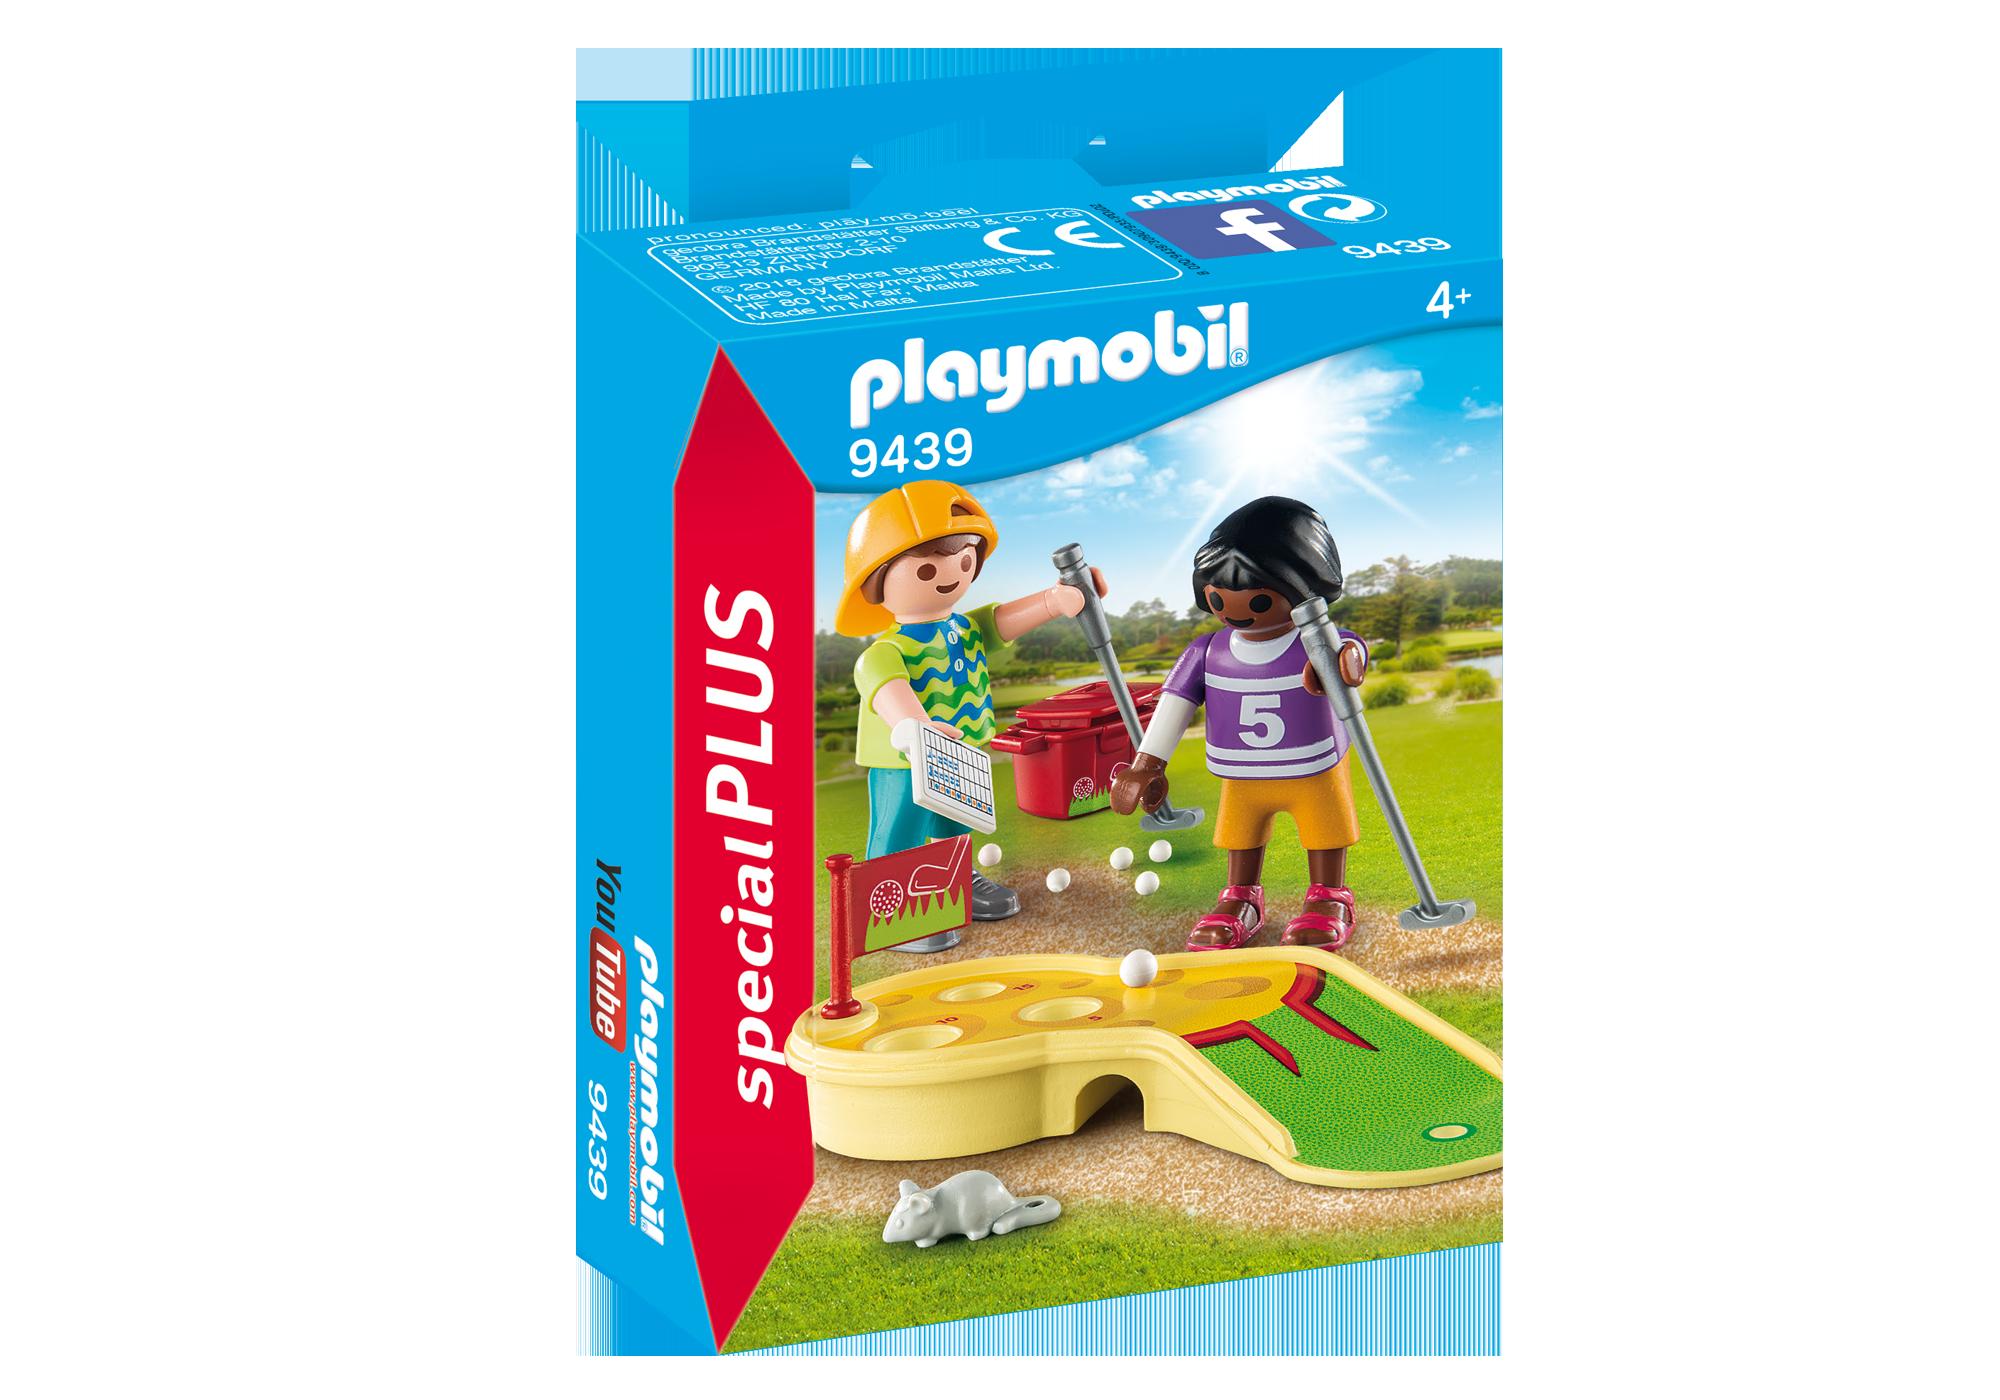 http://media.playmobil.com/i/playmobil/9439_product_box_front/Børn ved minigolfspil